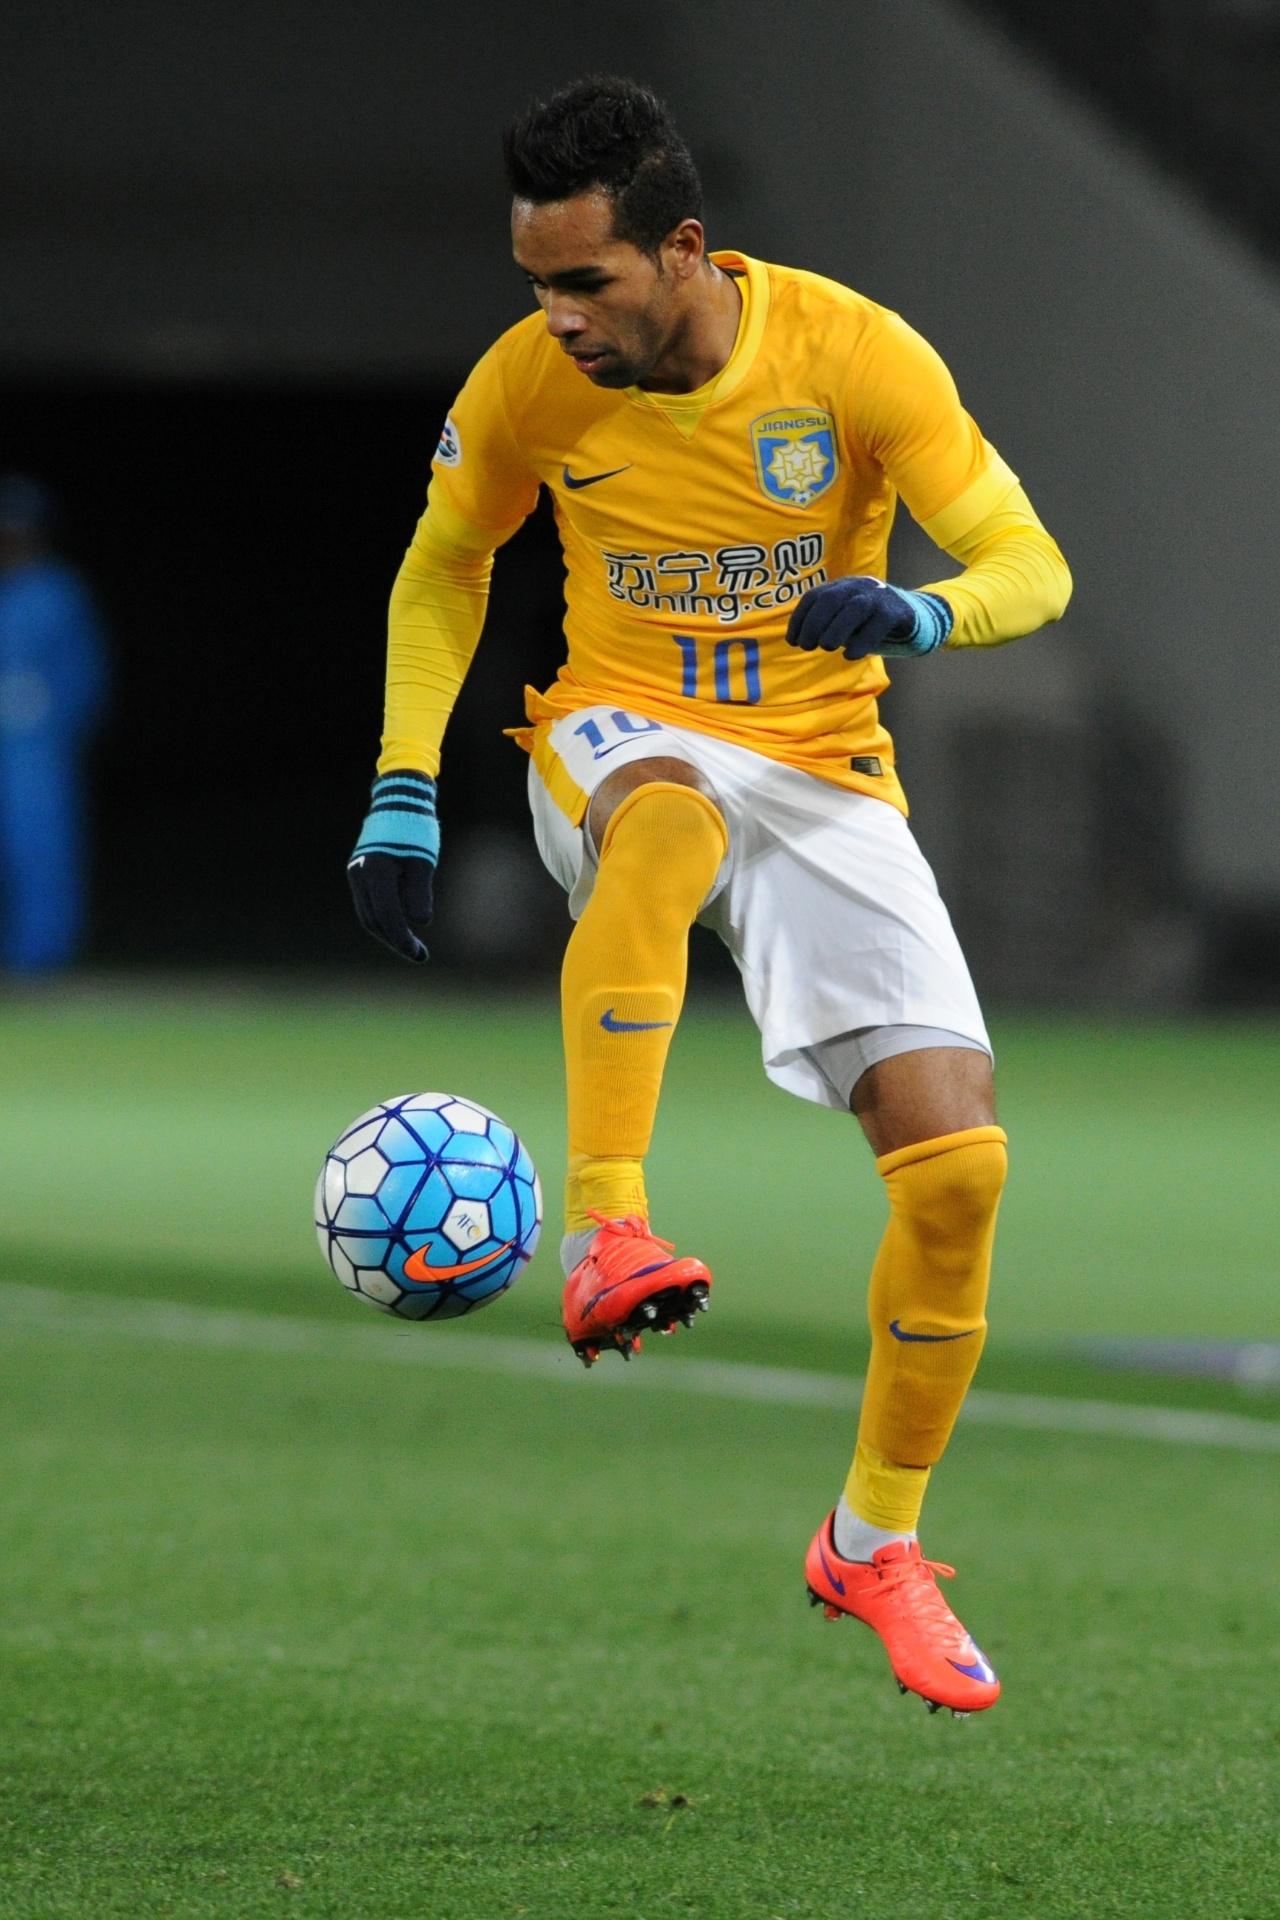 Alex Teixeira custará R  8 mi ao Corinthians e tem cláusula para Europa -  24 02 2018 - UOL Esporte 9578a25269528